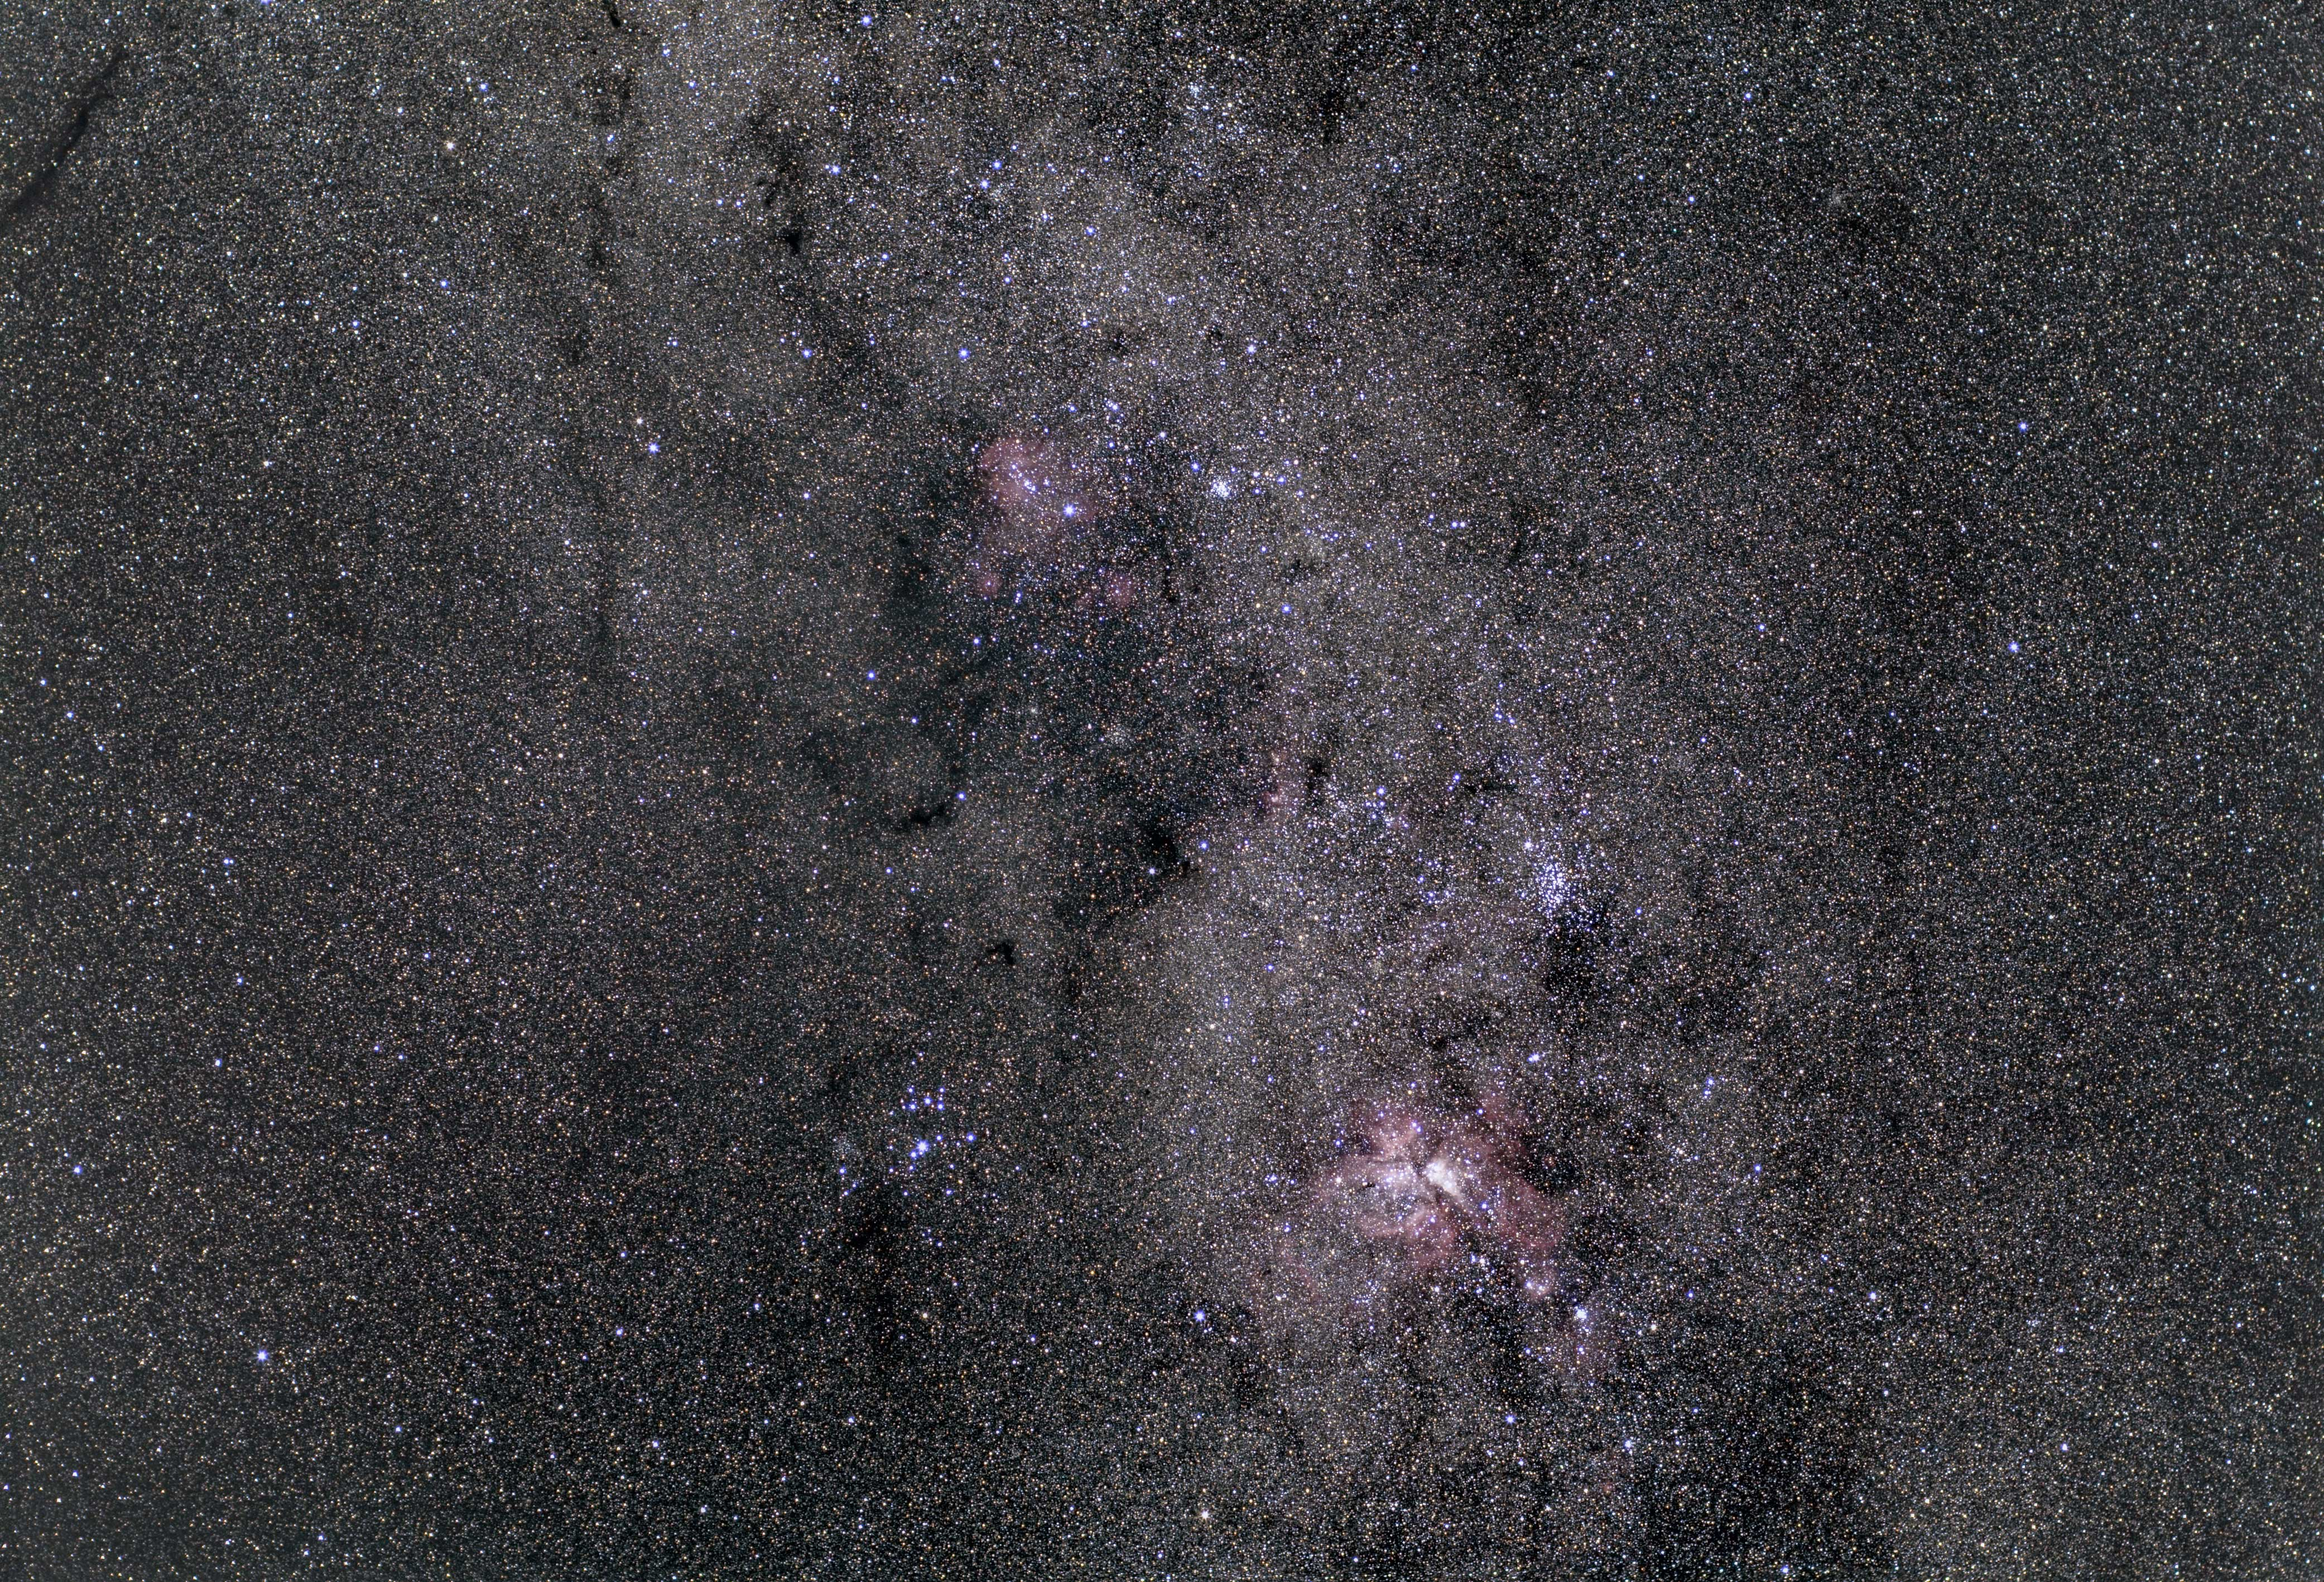 Eta Carinae wide field captured using an Olympus 50mm lens  & ASI294MC Pro camera